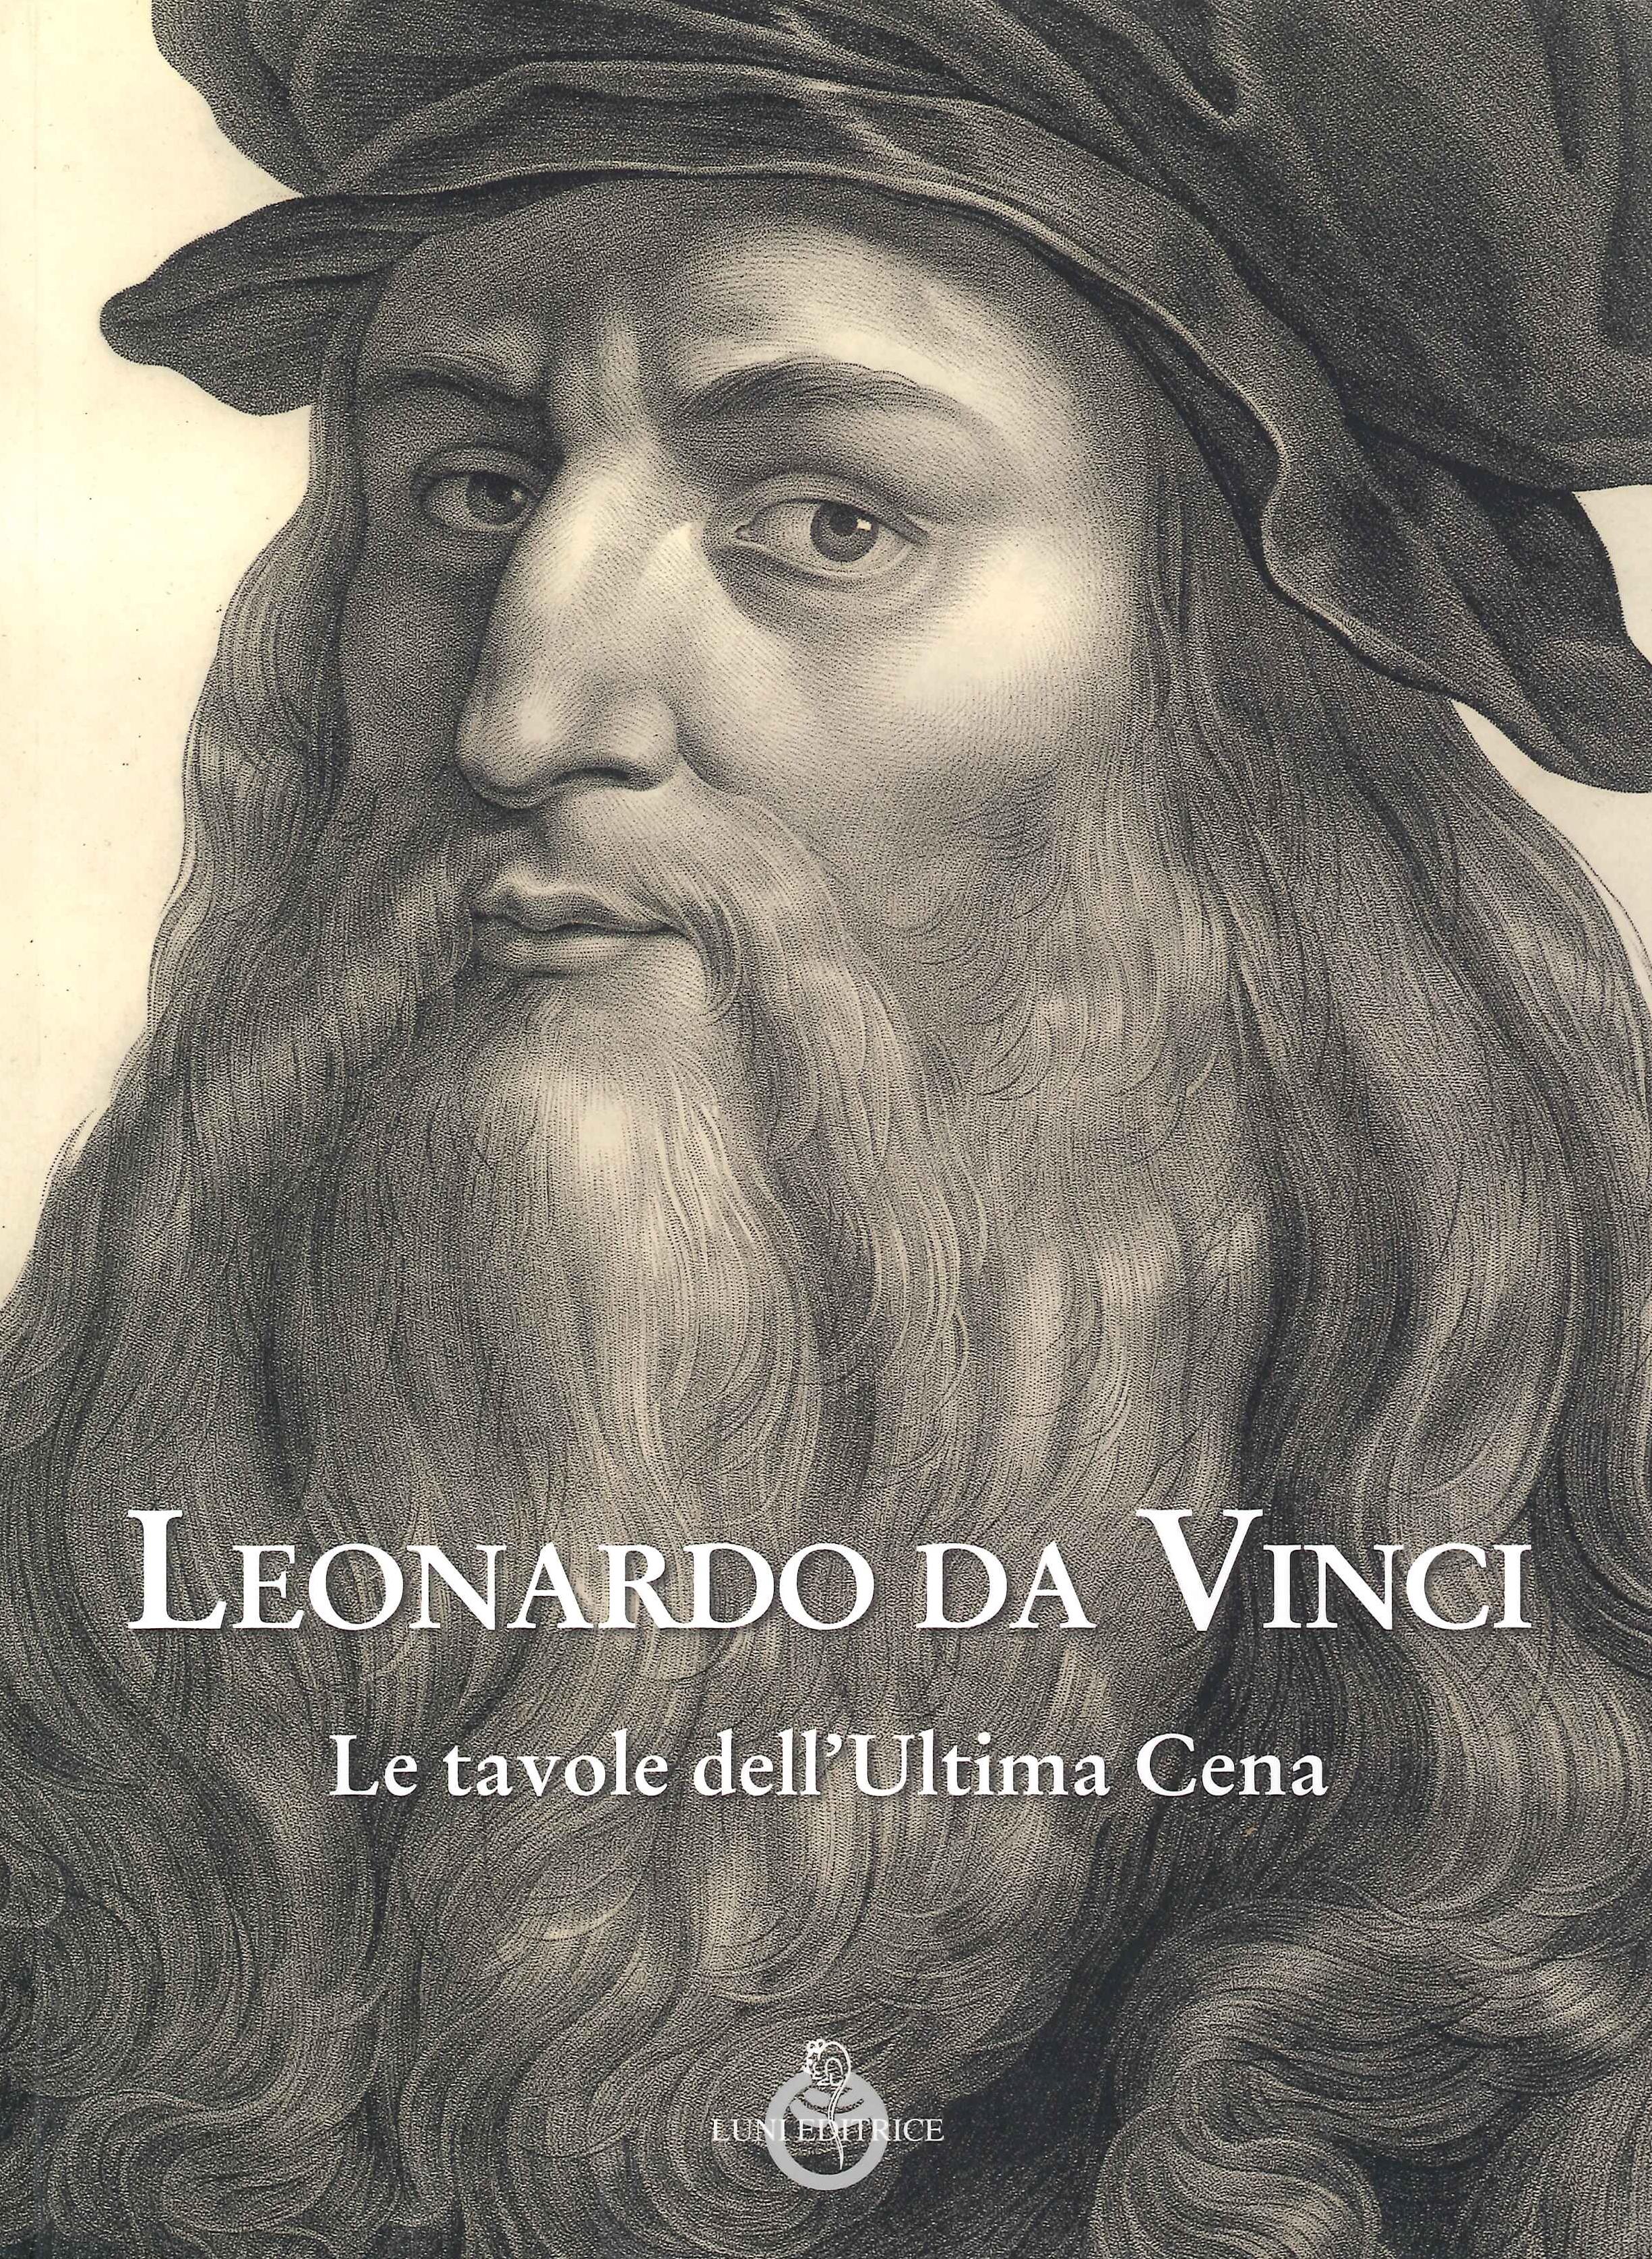 Leonardo da Vinci. Le tavole dell'ultima cena. Ediz. illustrata